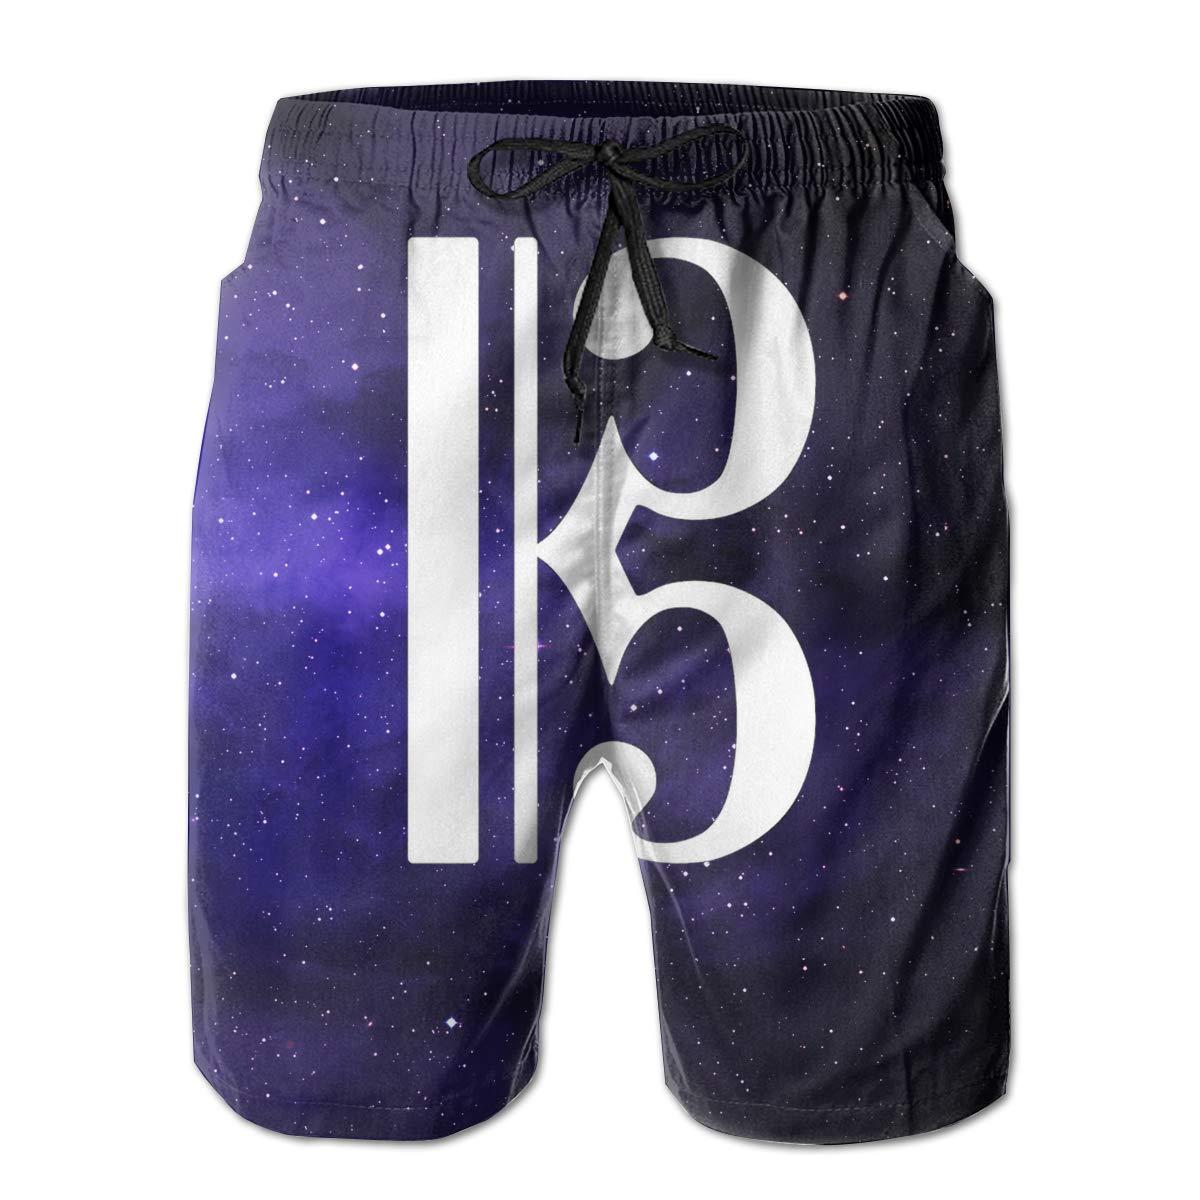 Eofjbg Fashion Mens C-Clef Alto Clef Beach Shorts Board Shorts Casual Shorts Swim Trunks